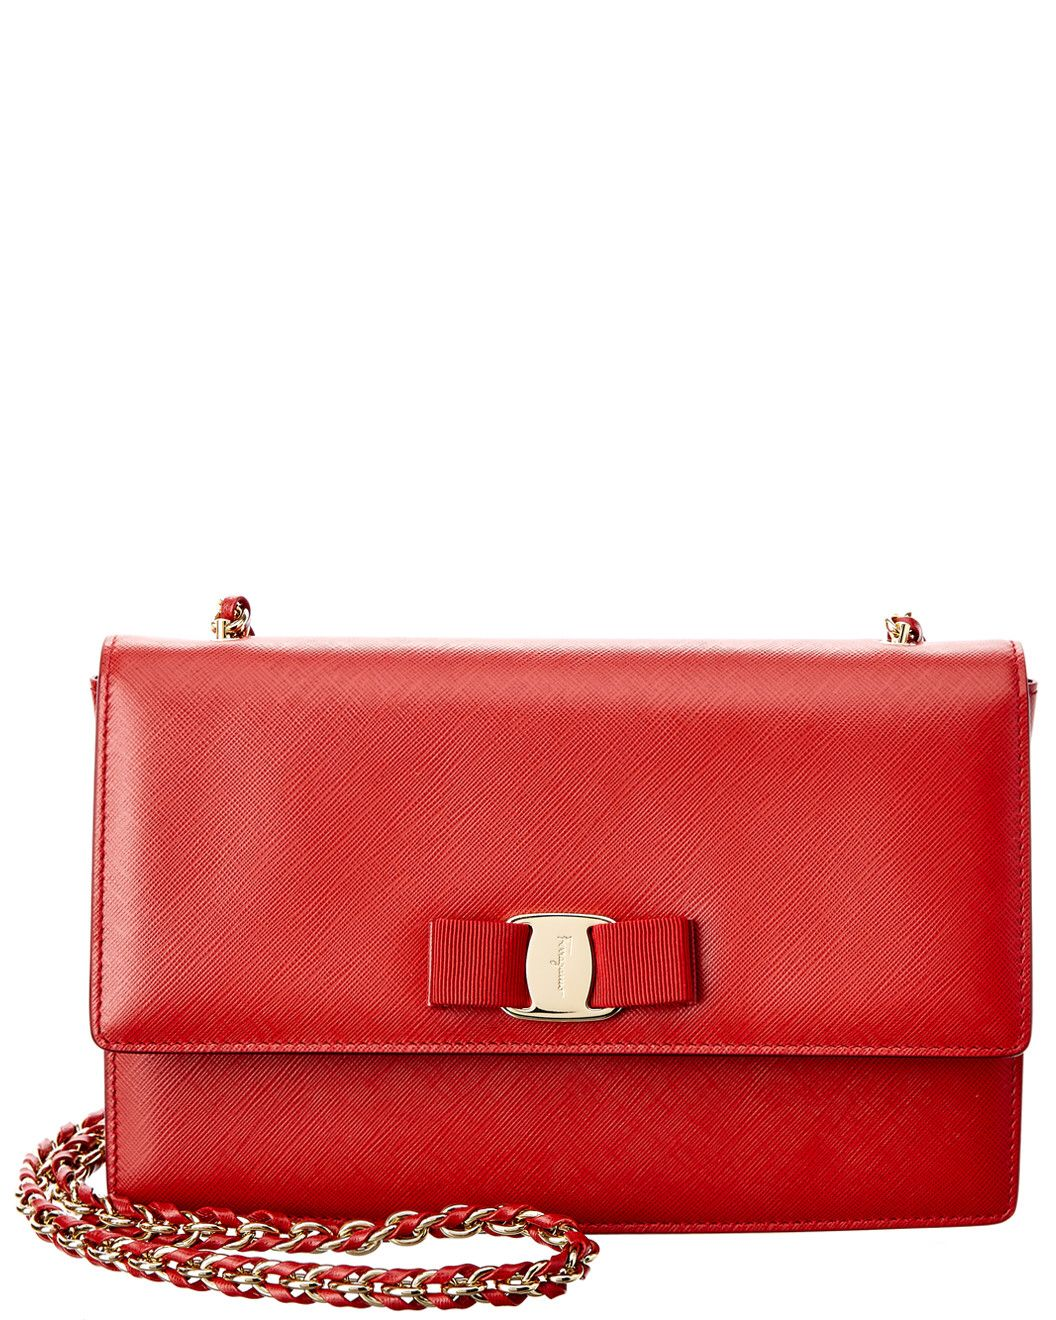 2d9f4d0e238c20 You need to see this Salvatore Ferragamo Ginny Medium Vara Leather Flap Bag  on Rue La